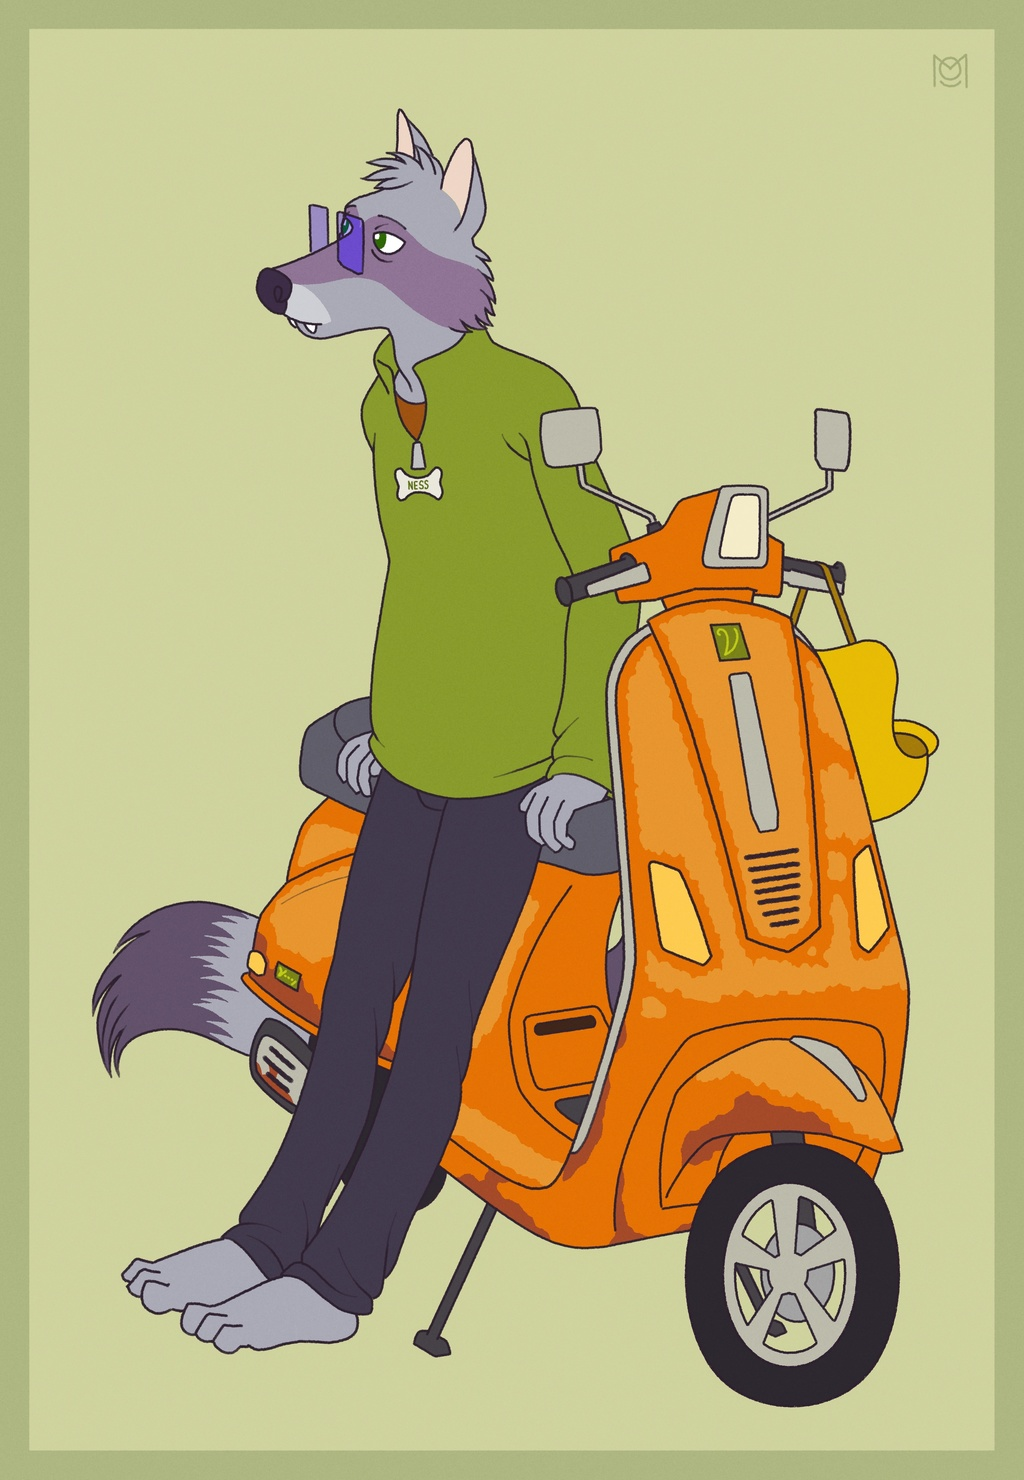 [Commission] Urban rides